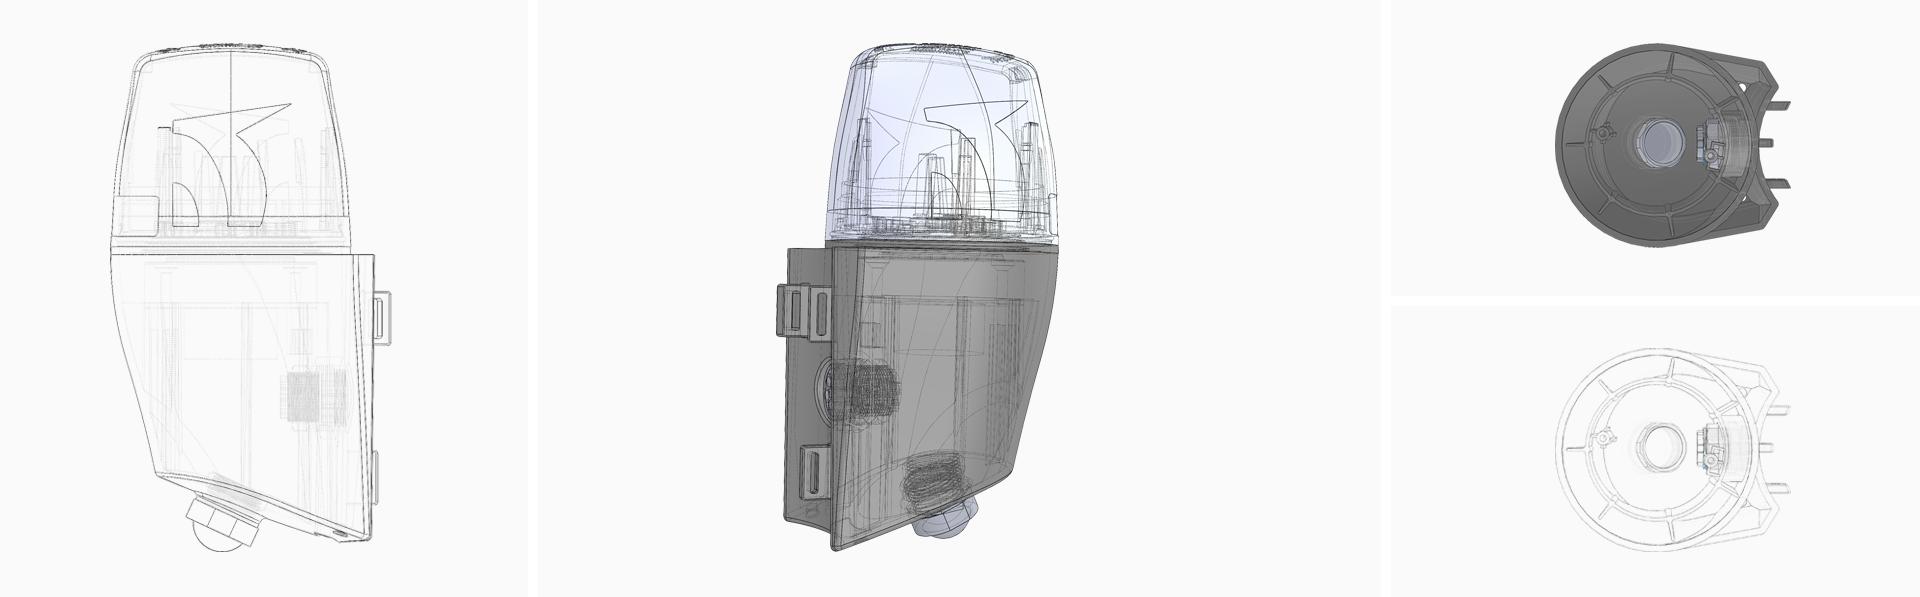 prototyping-design büro-mainz-loew design